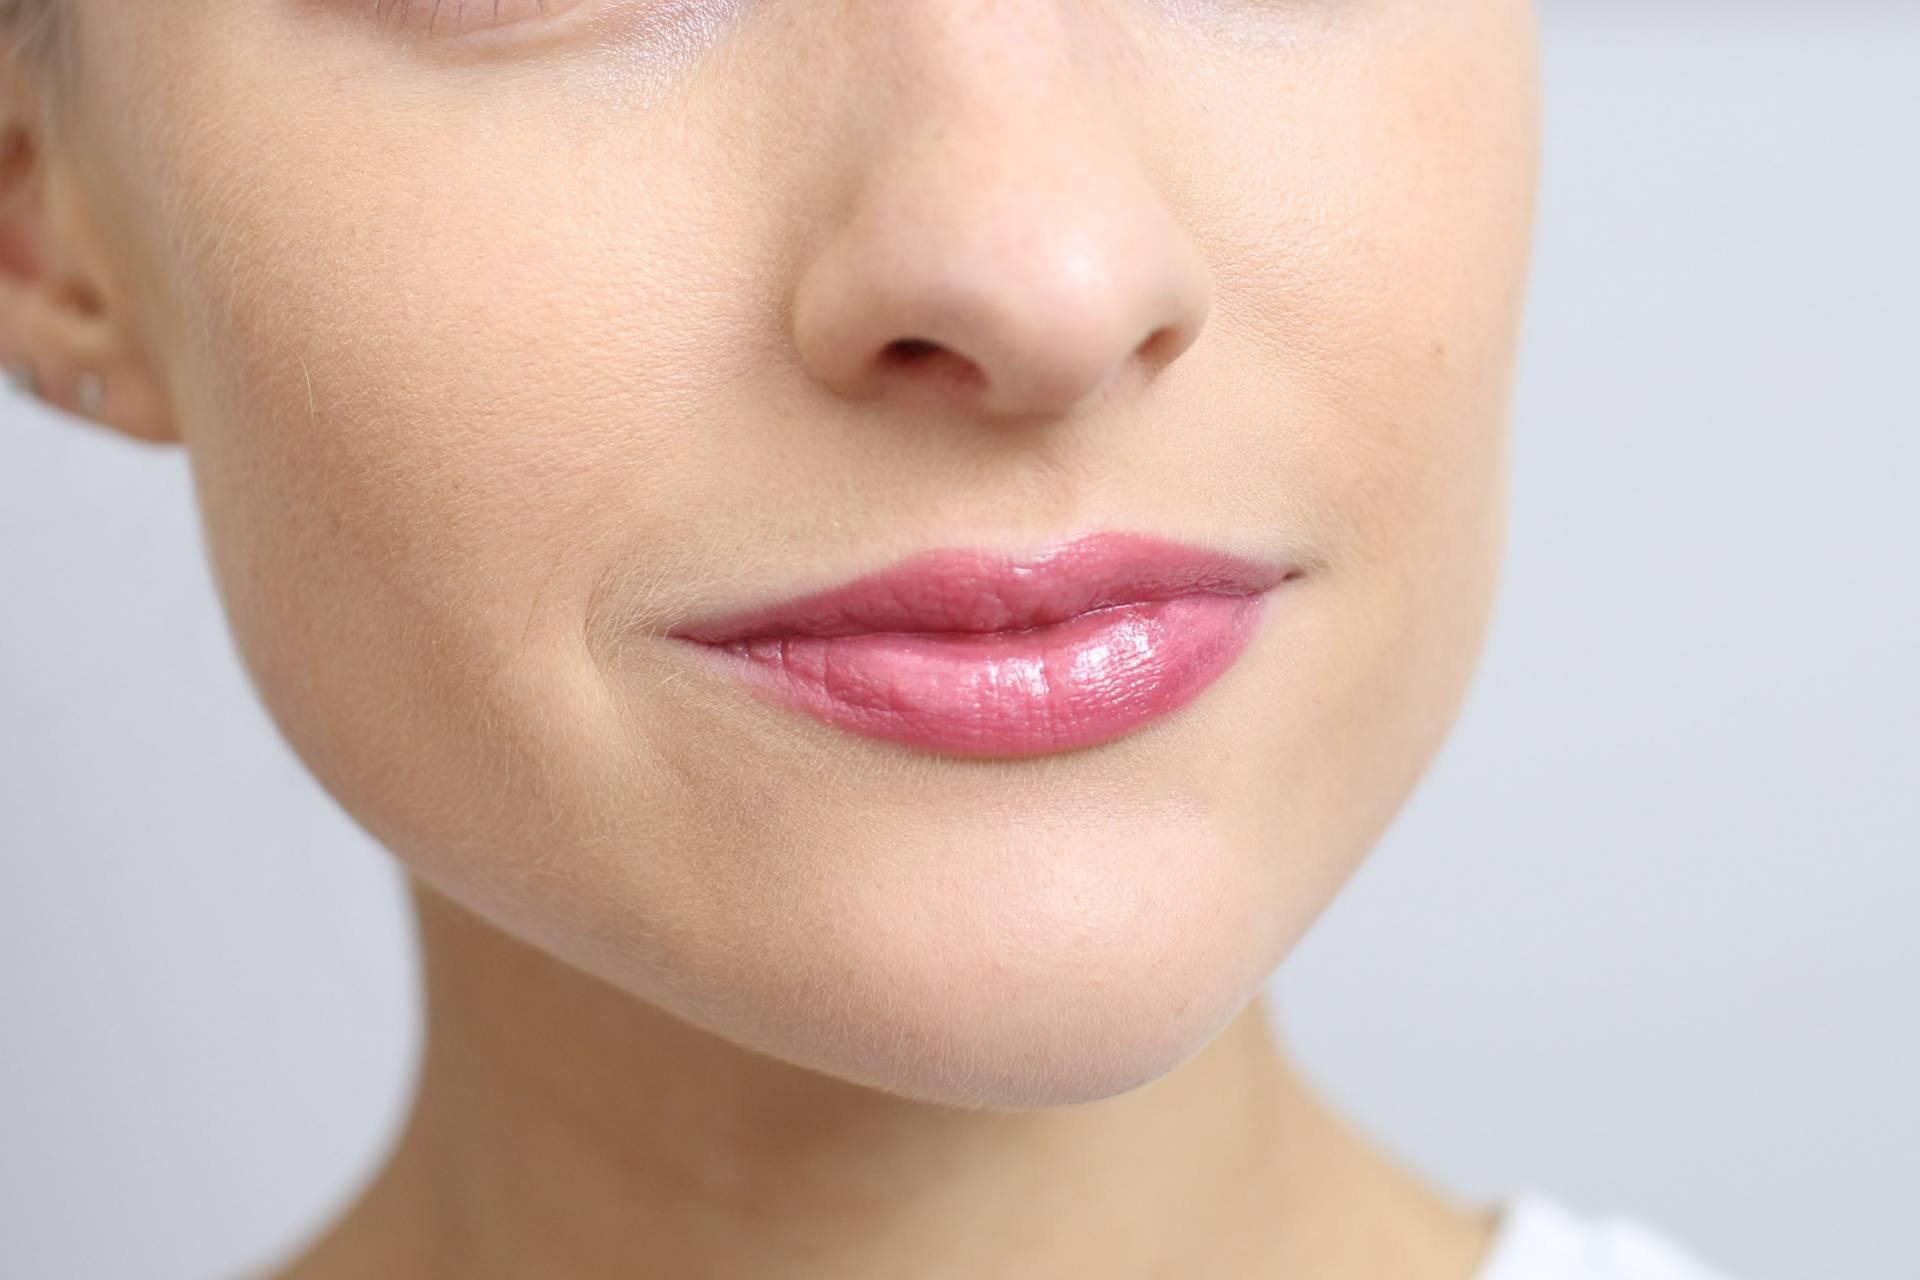 Dior Addict: Why I'm Definitely Addicted - Inthefrow